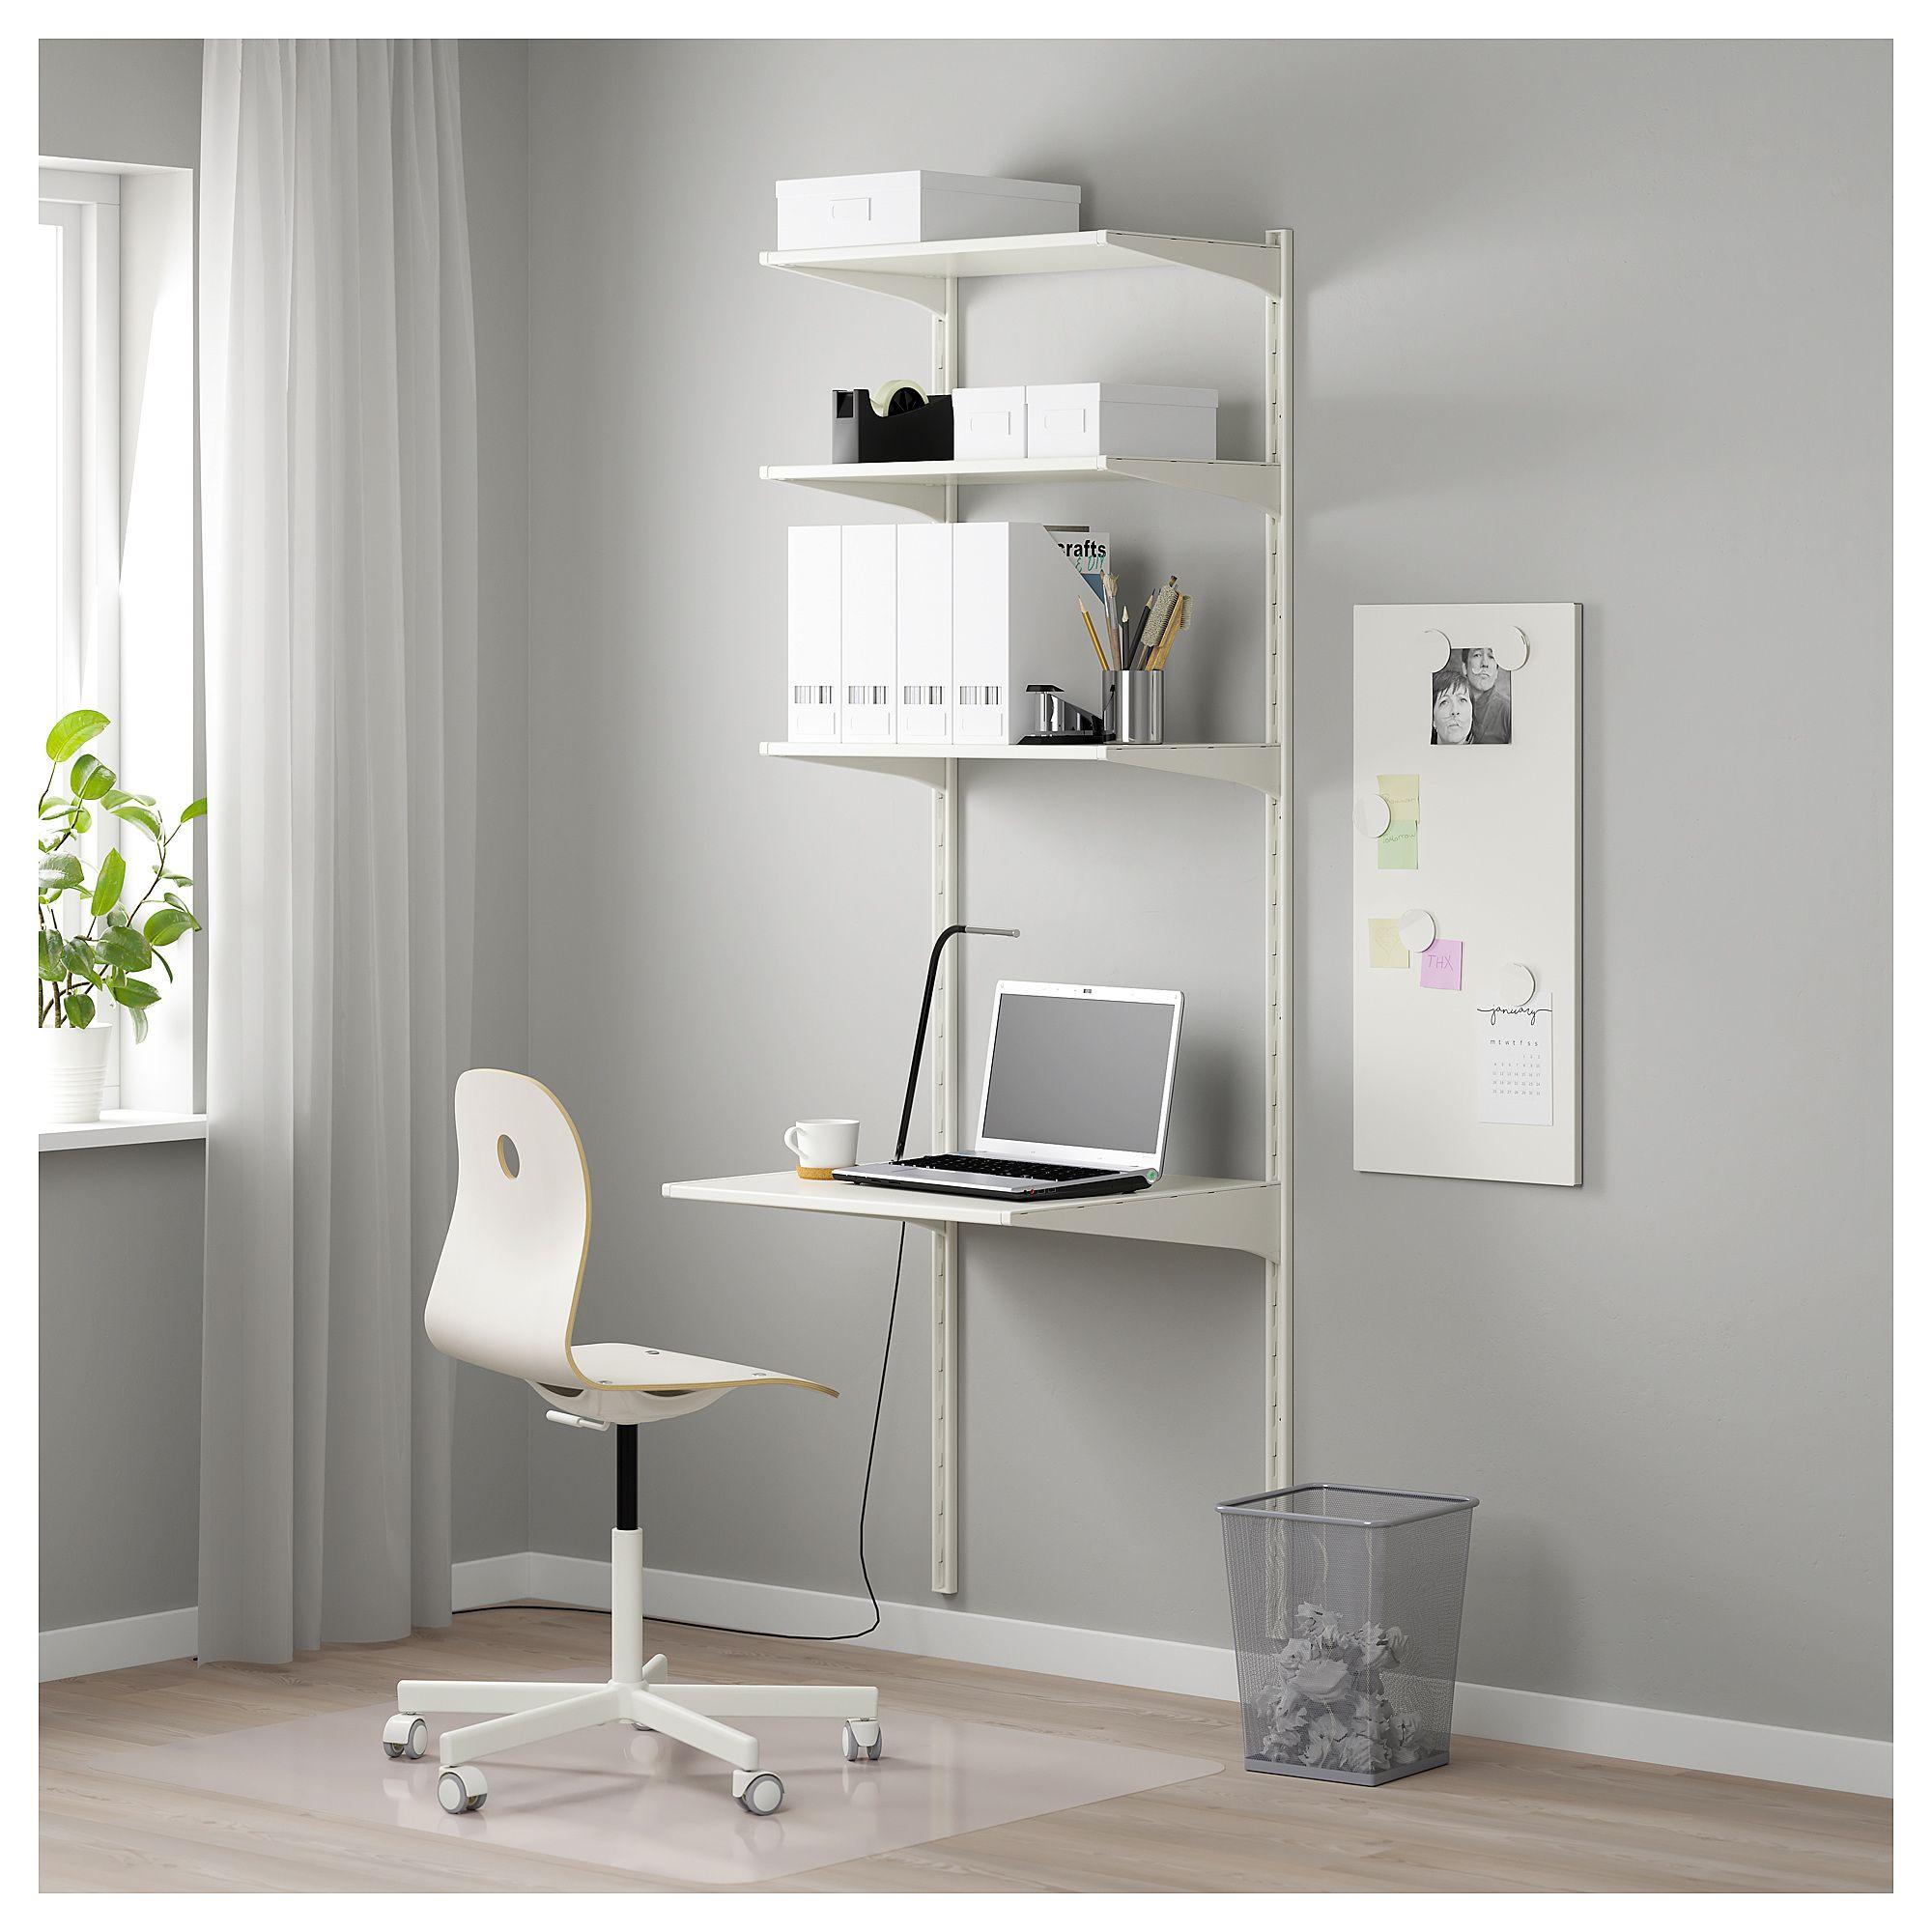 ALGOT Wall upright/shelves white 26x24x77 1/2